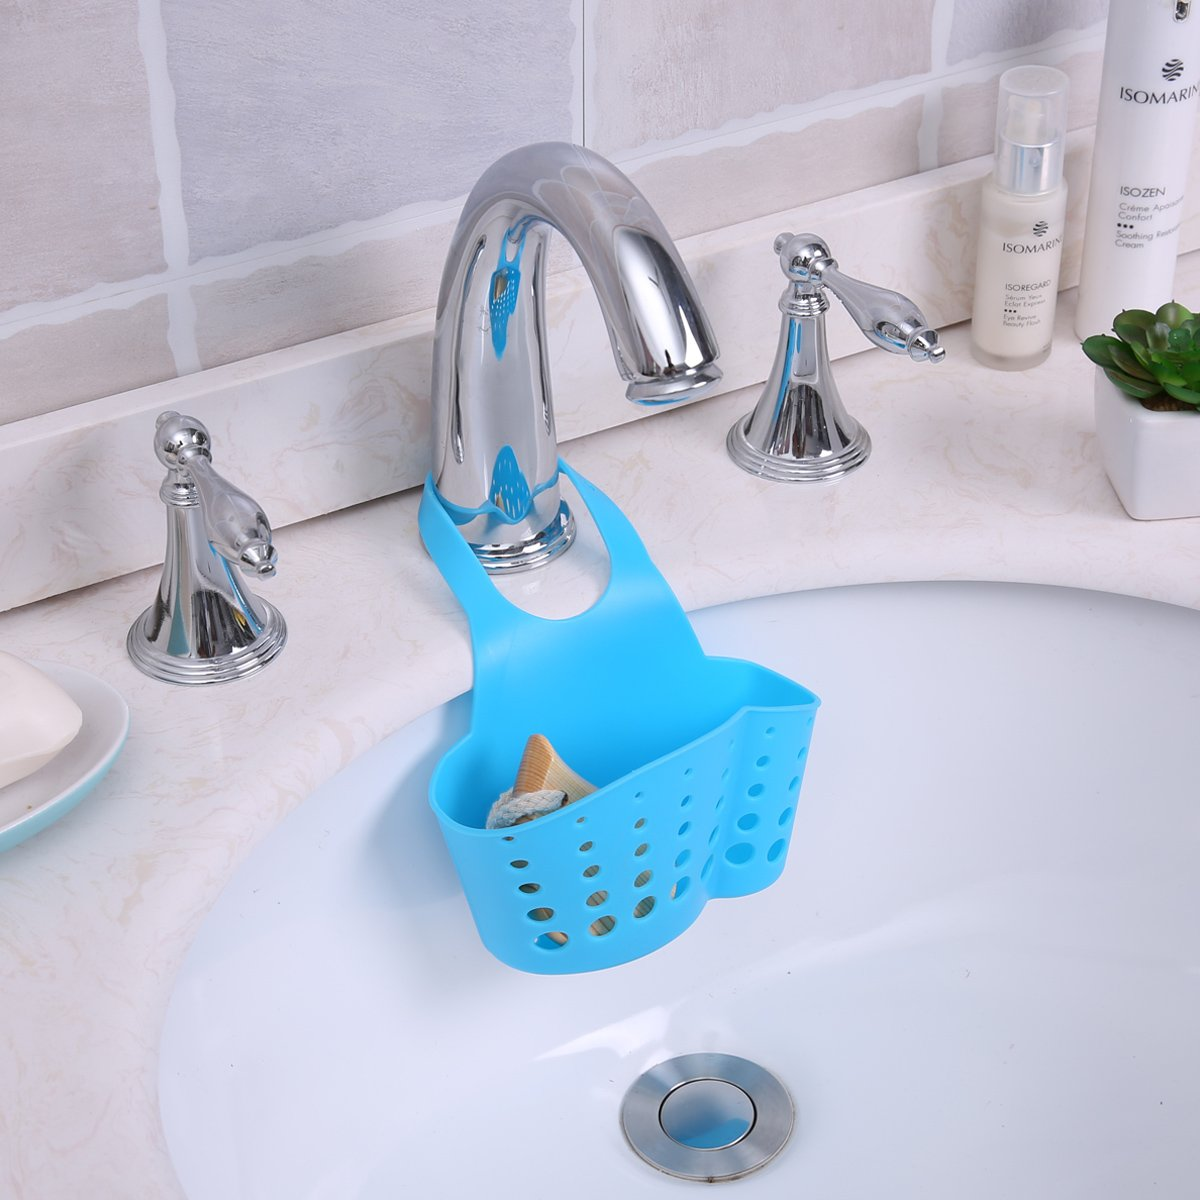 Amazon.com - Sink Caddy Sponge Holder Soap Holder, Eunion 2 Pack ...